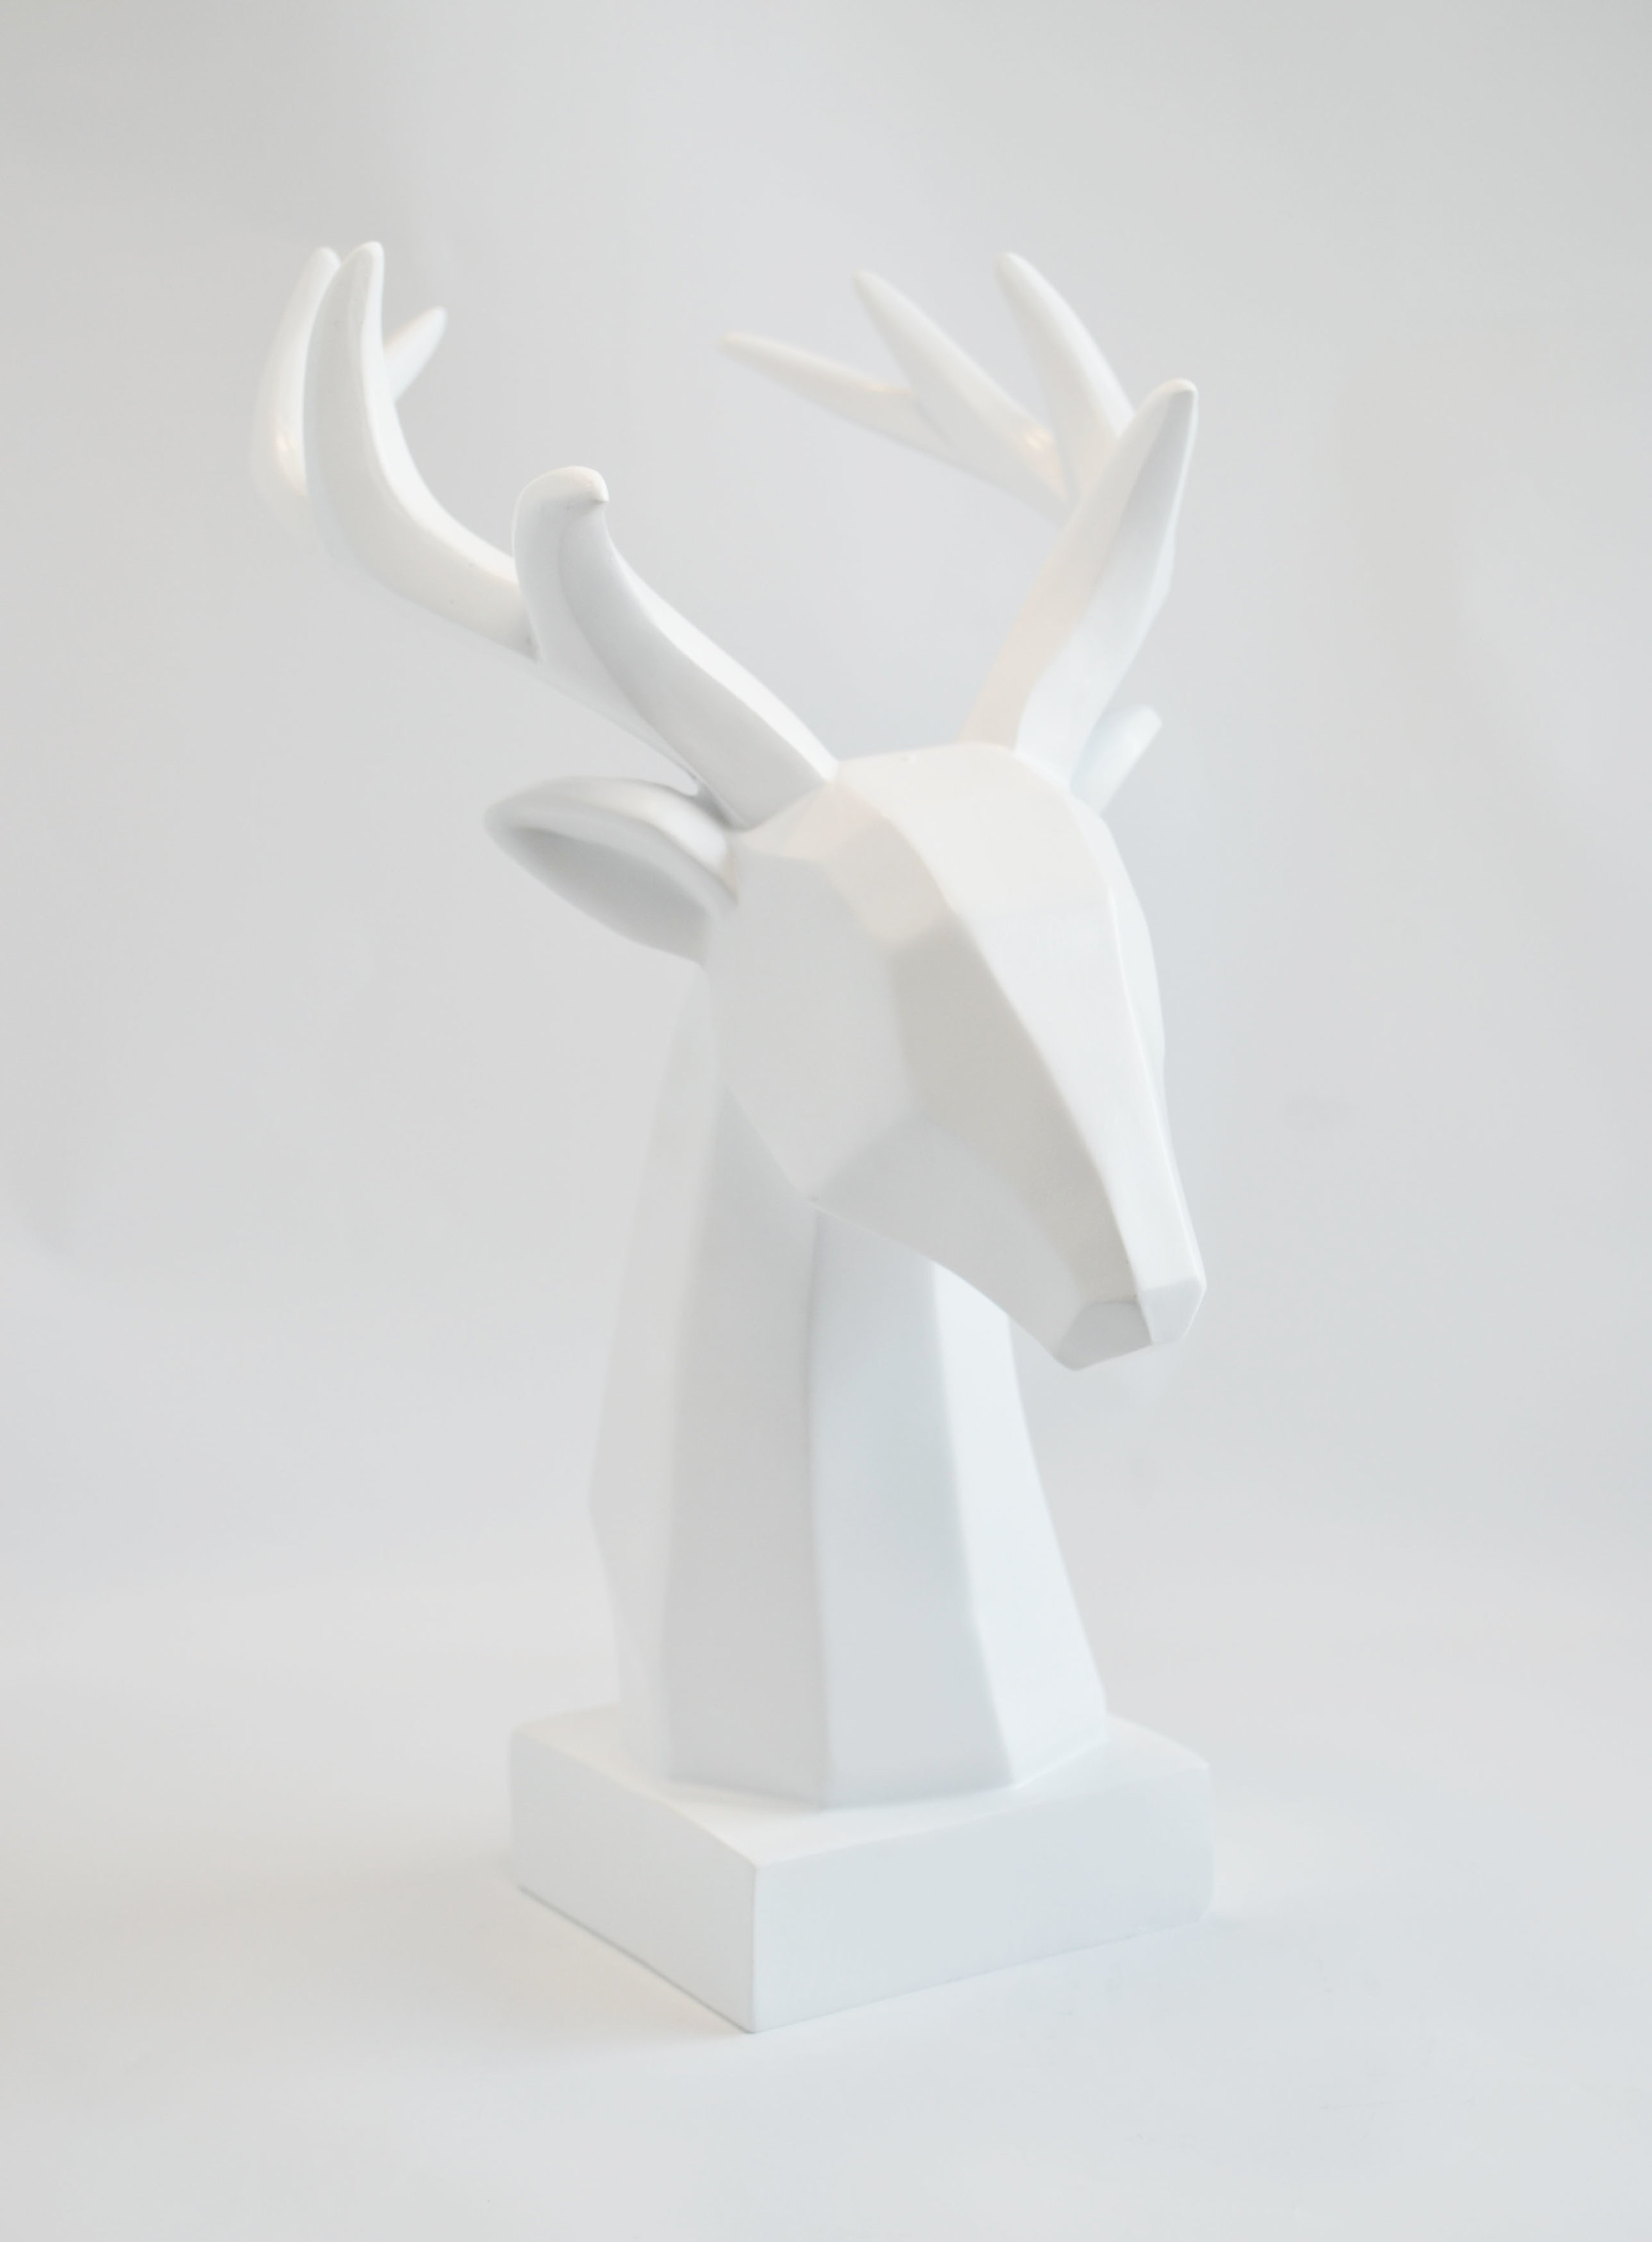 white deer prop   Quantity: 2  Price: $25.00